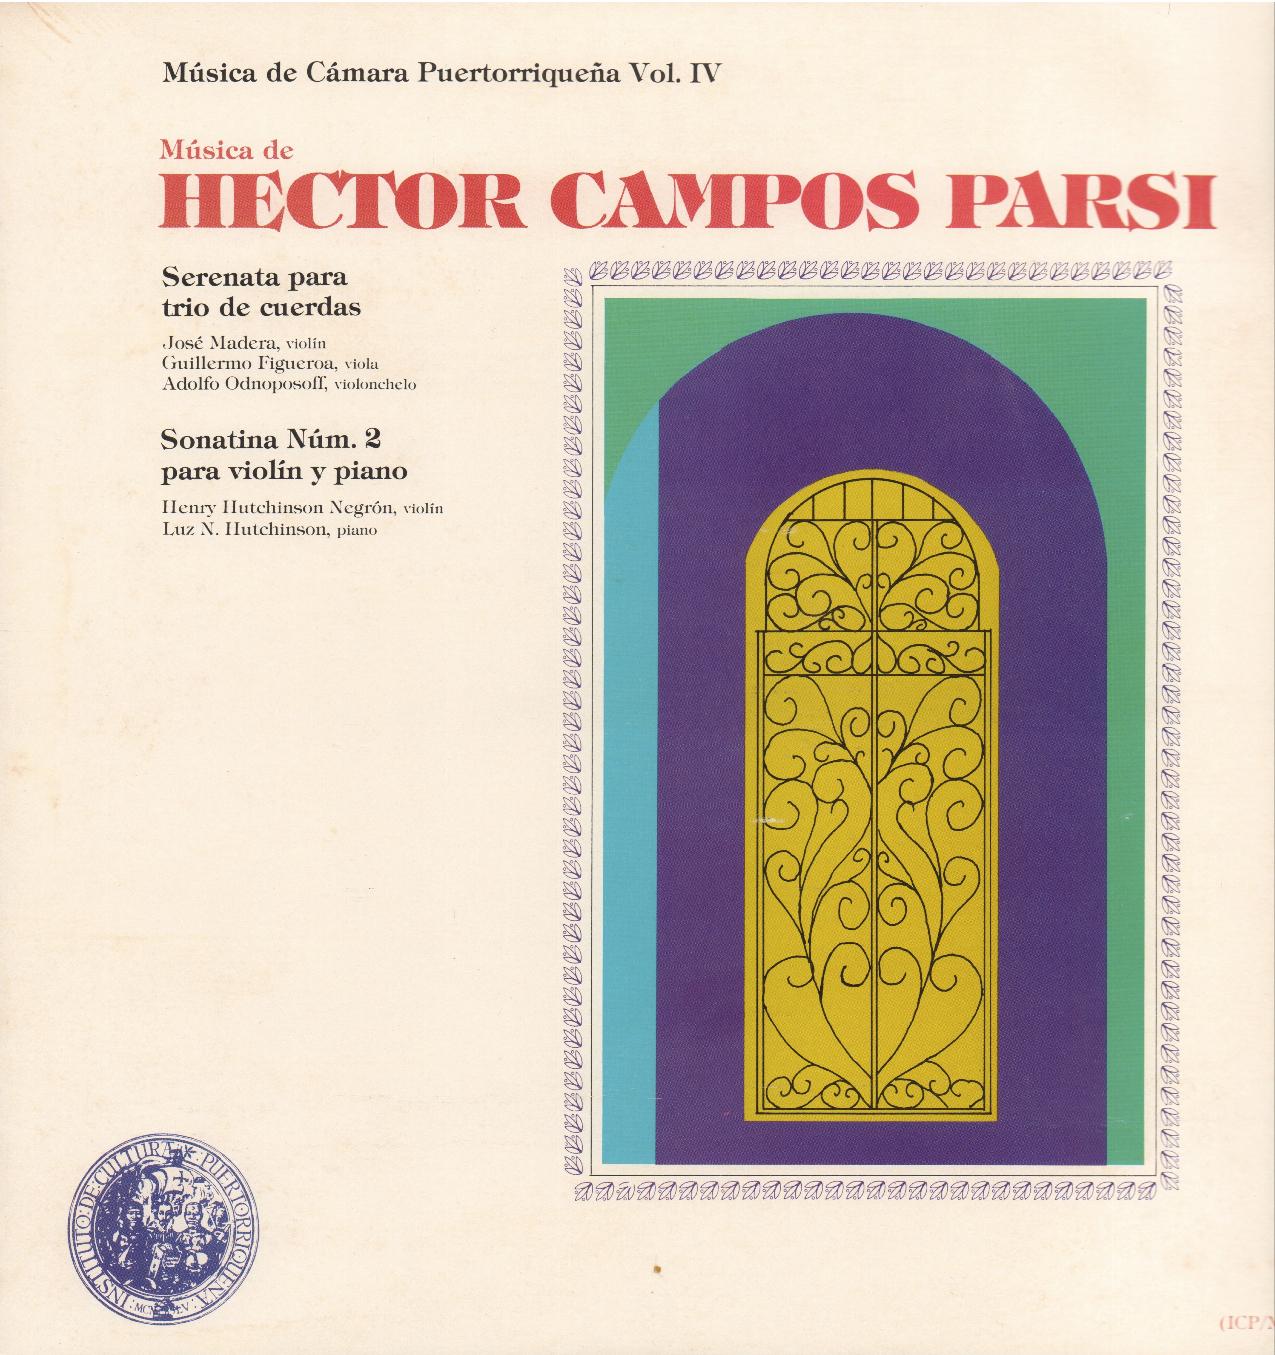 Música de Héctor Campos Parsi